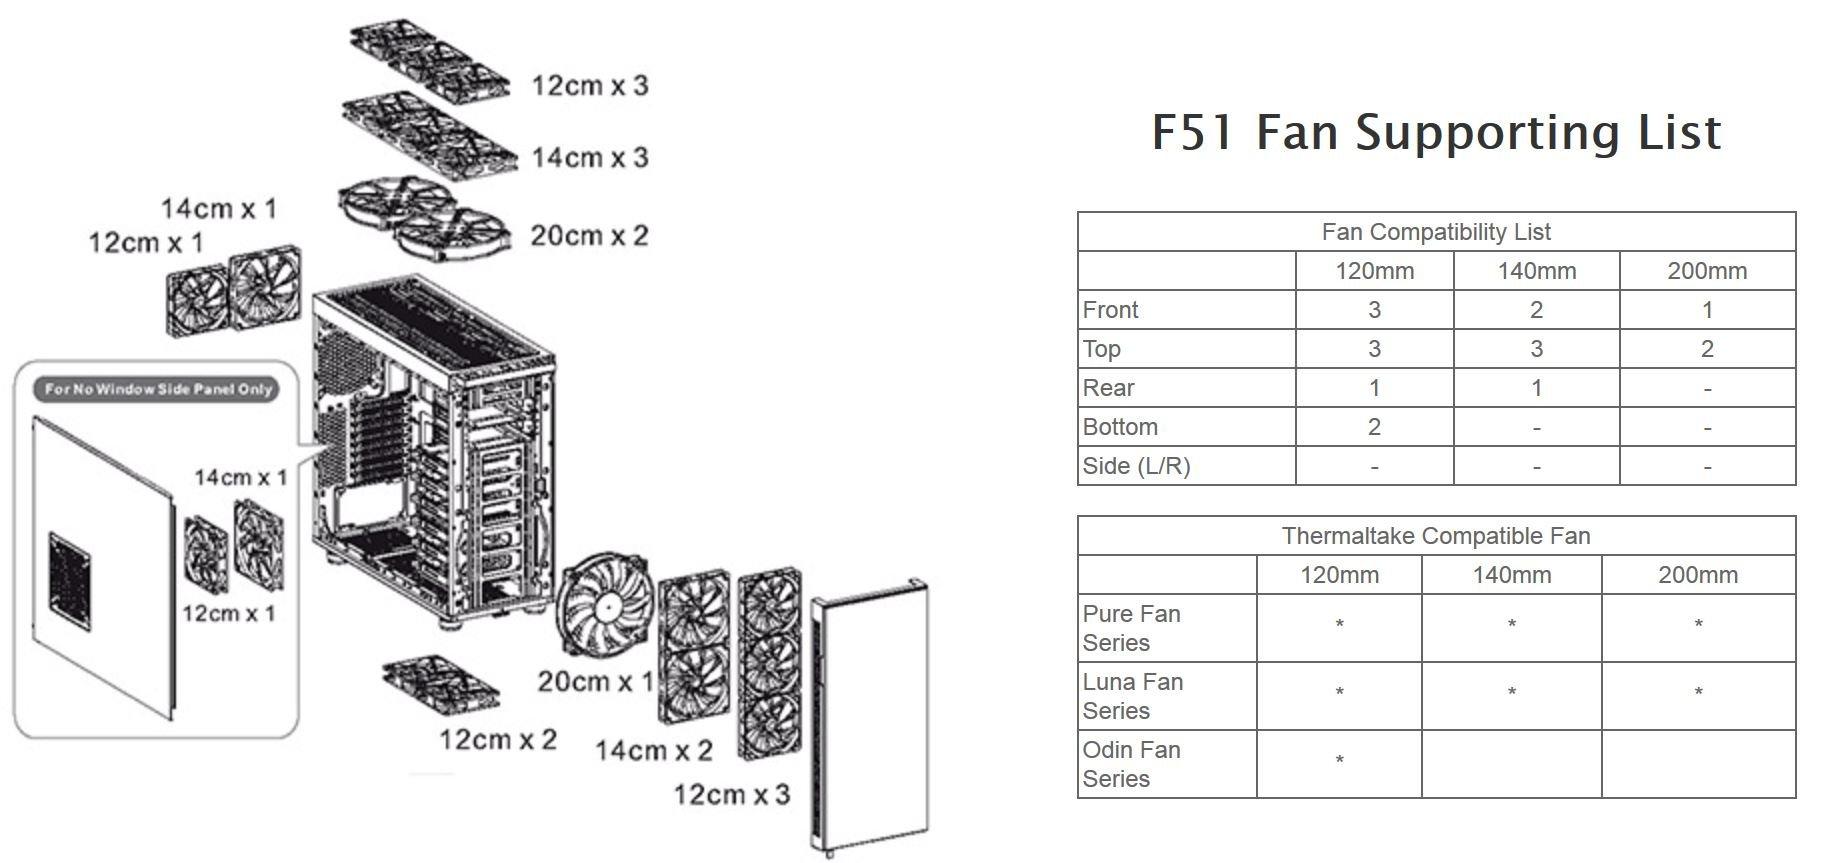 Thermaltake Suppressor F51